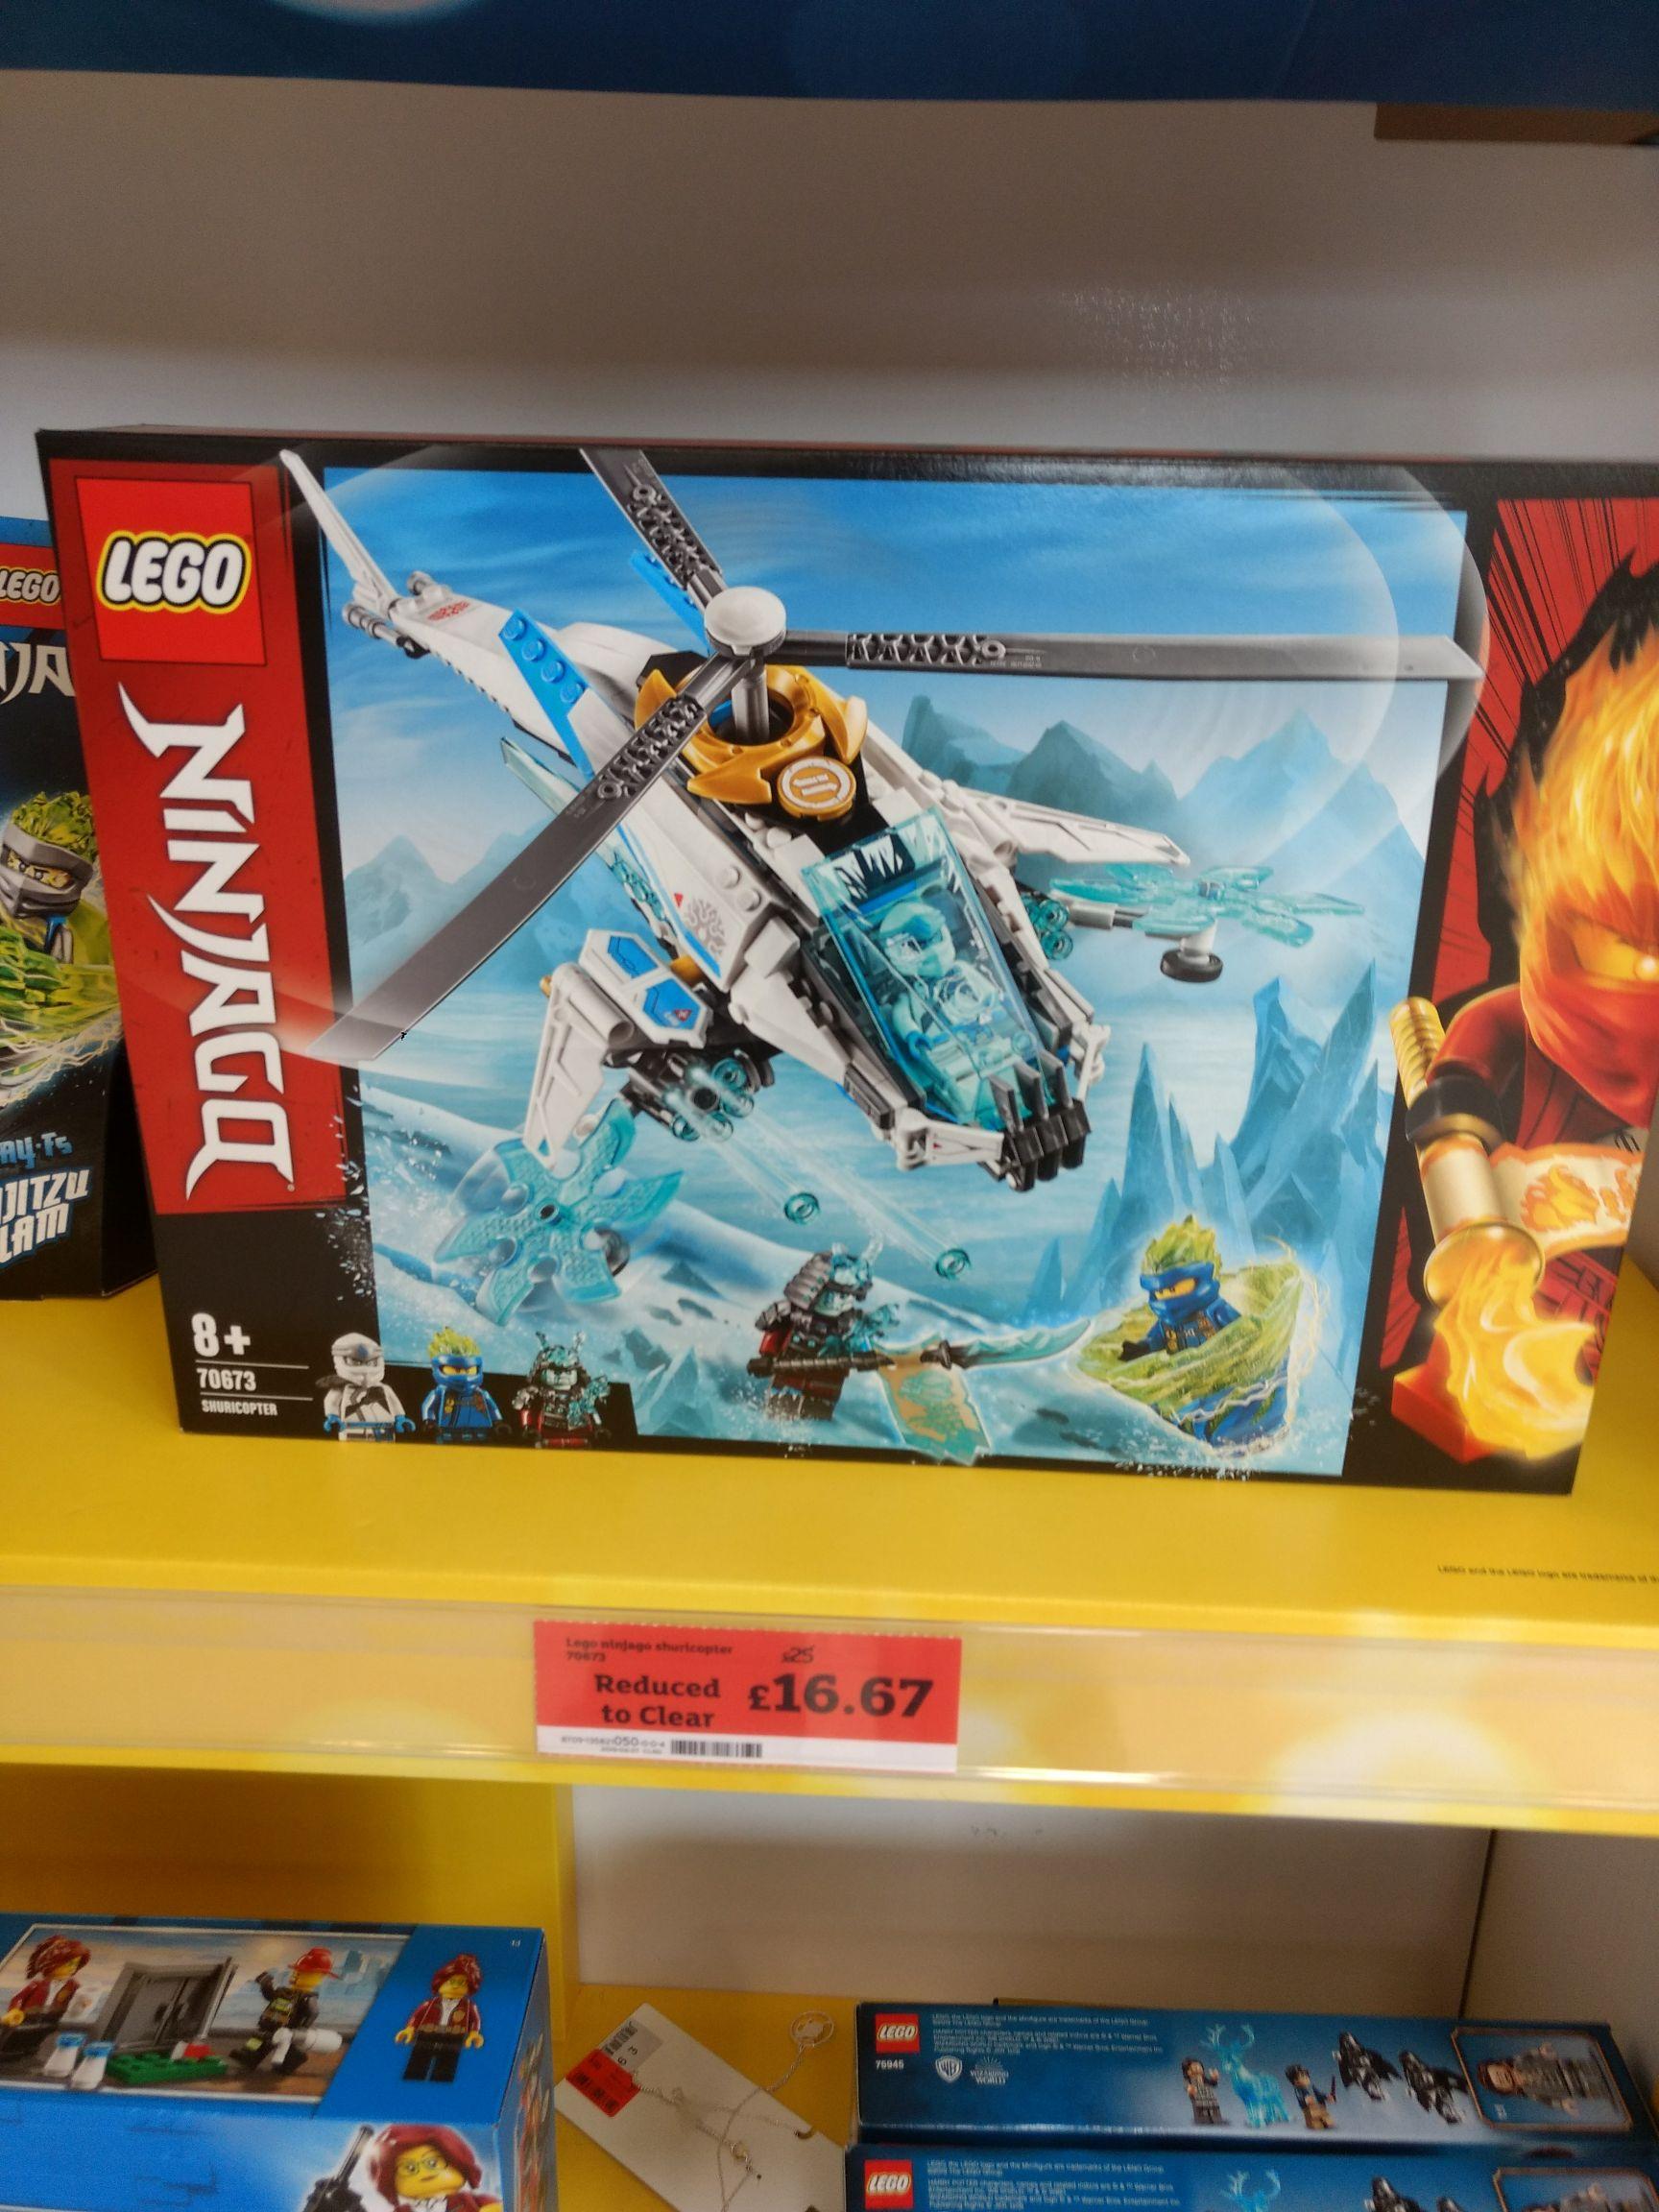 Lego Ninjago set £16.67 instore @ Sainsbury's